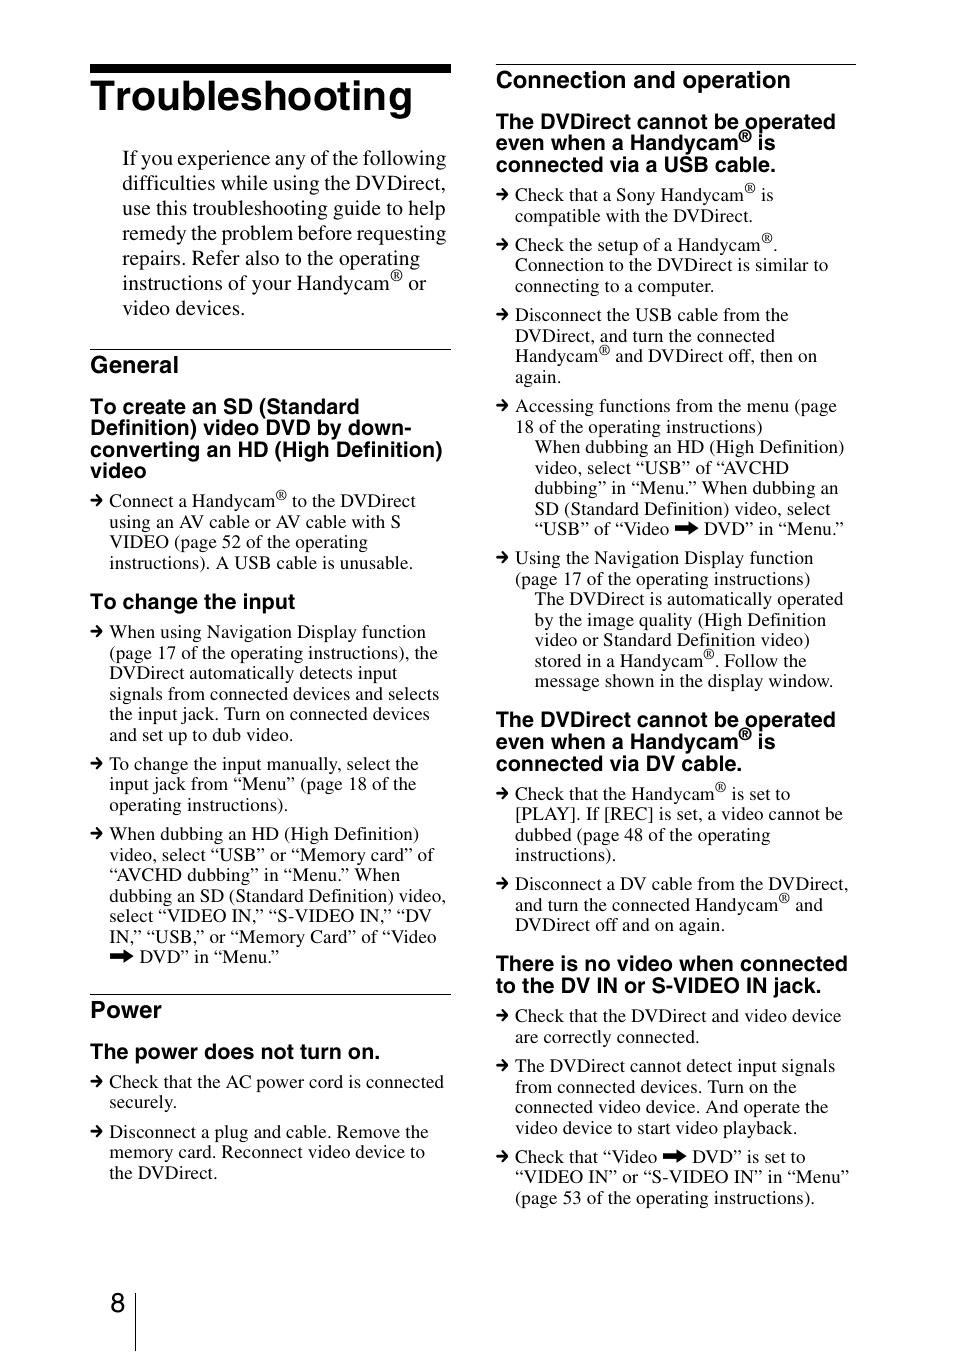 Troubleshooting, General, Power   Sony VRD-MC5 User Manual